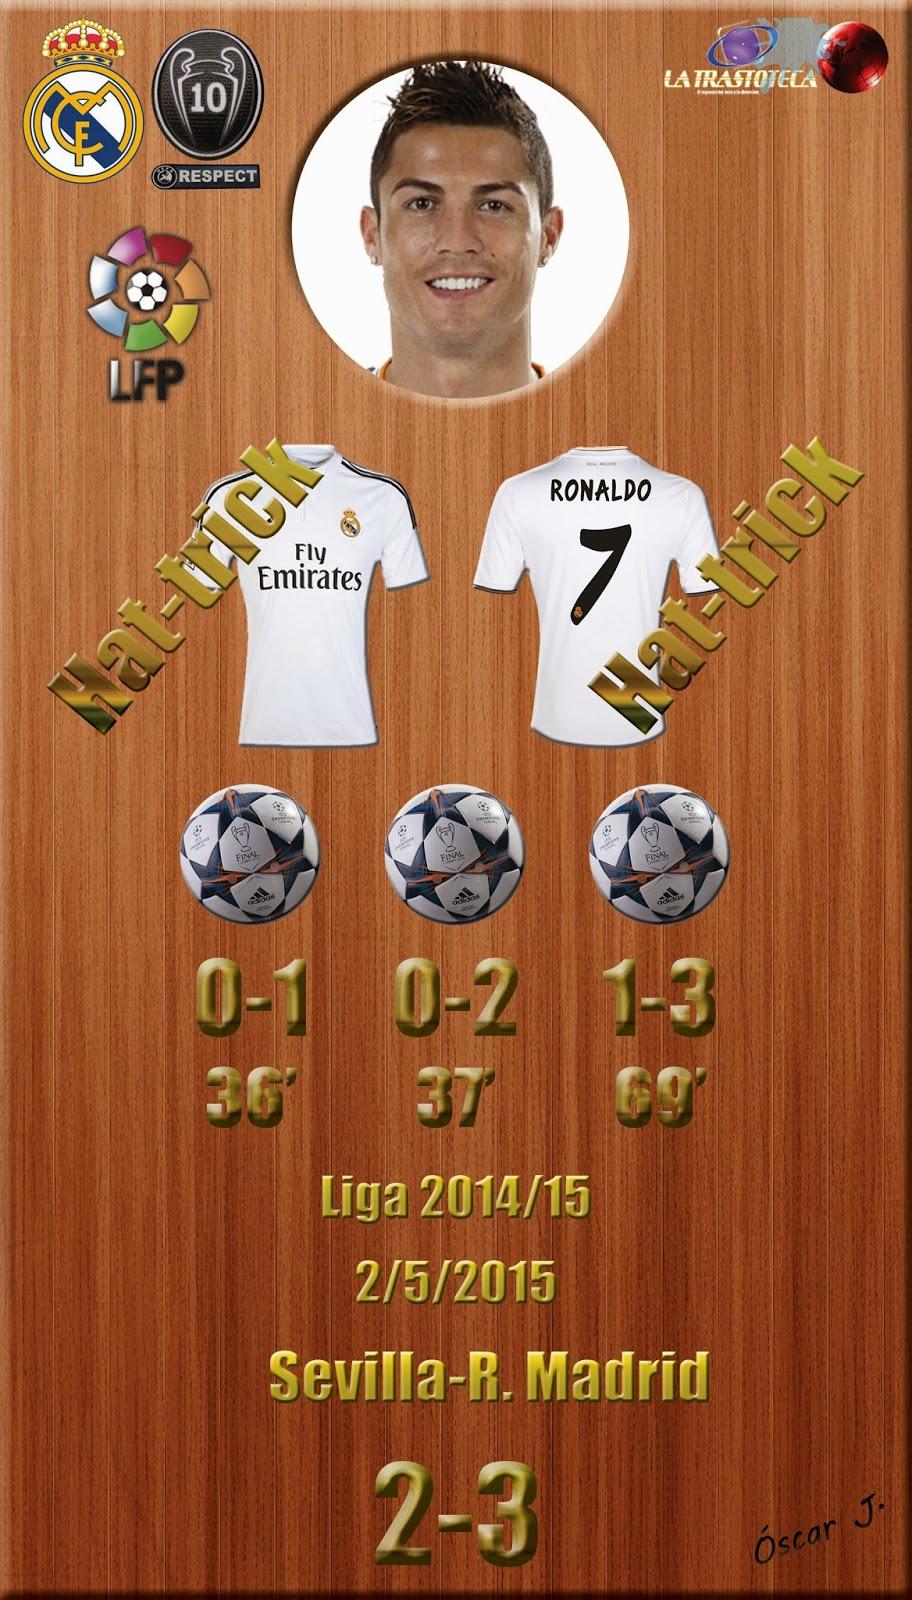 Sevilla 2 3 real madrid liga 2014 15 jornada 35 2 5 for Correo real madrid